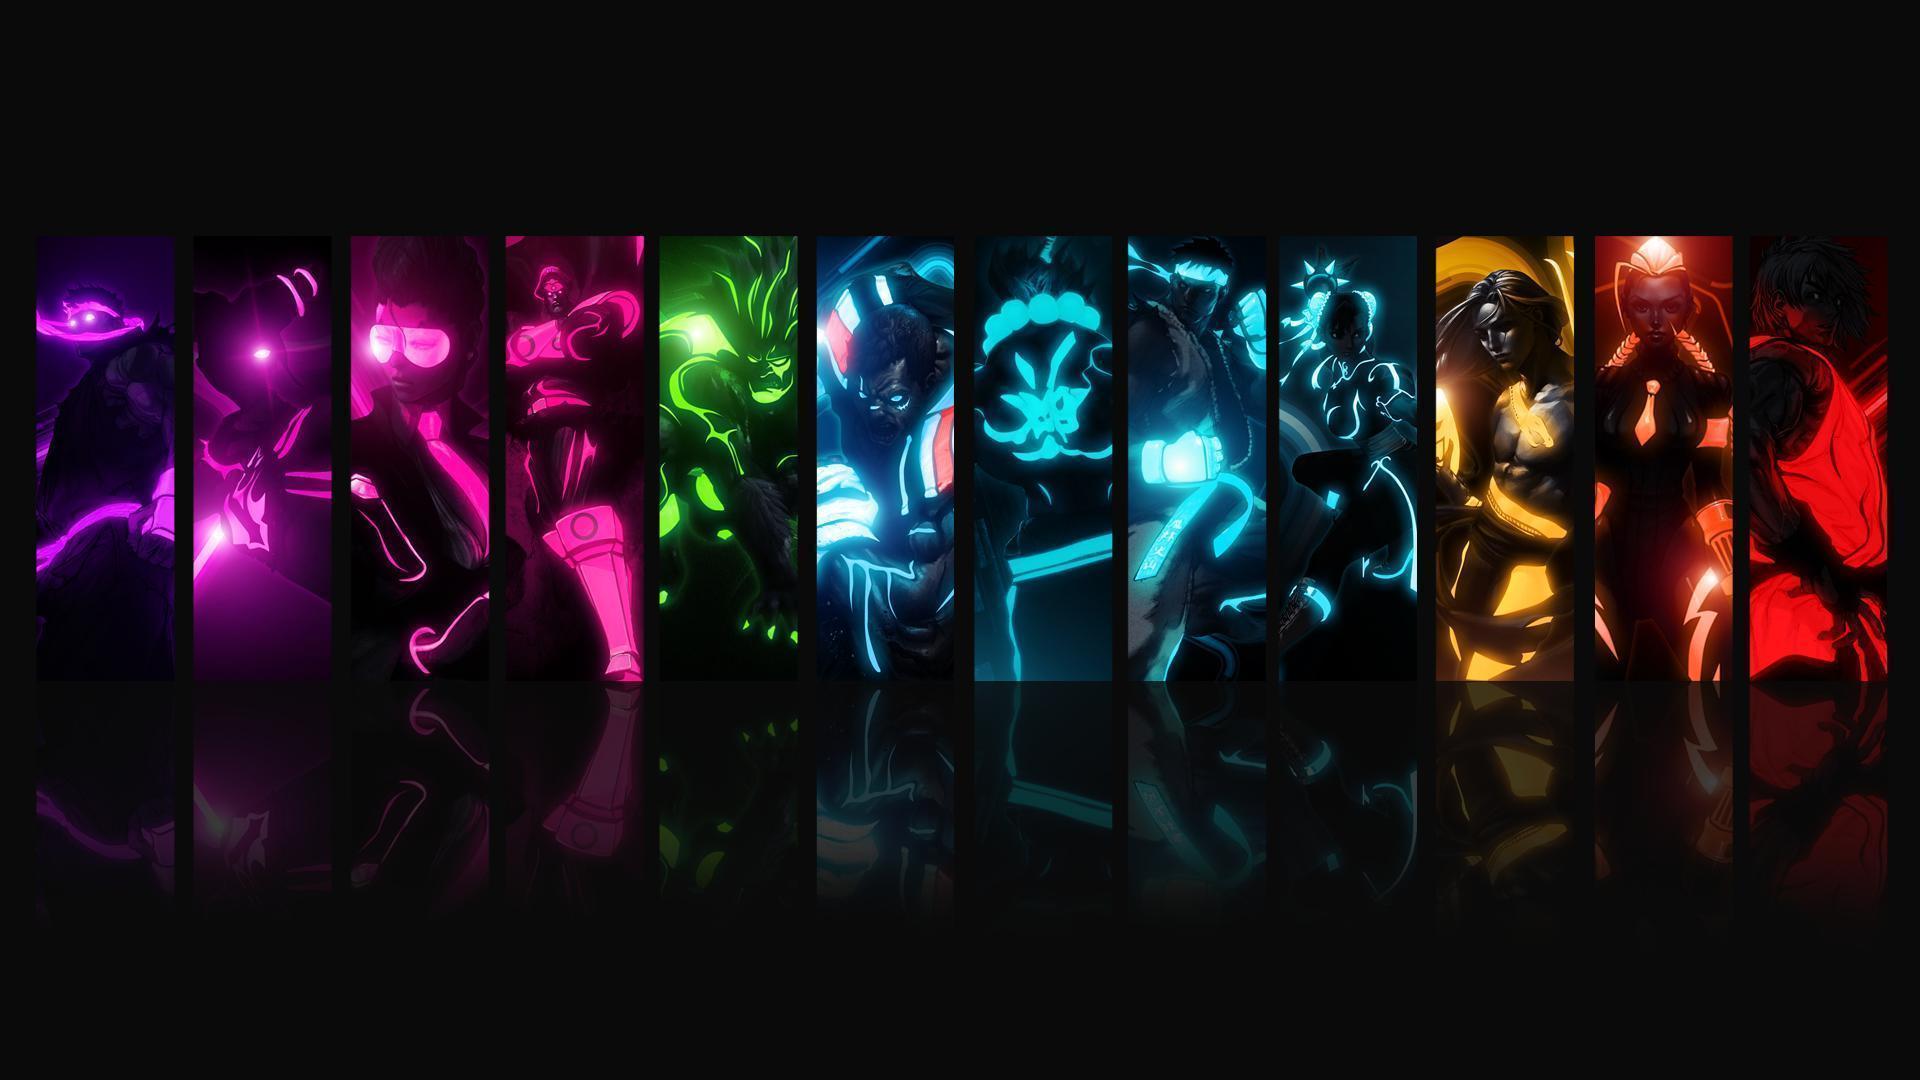 Neon Backgrounds For Desktop - Wallpaper Cave